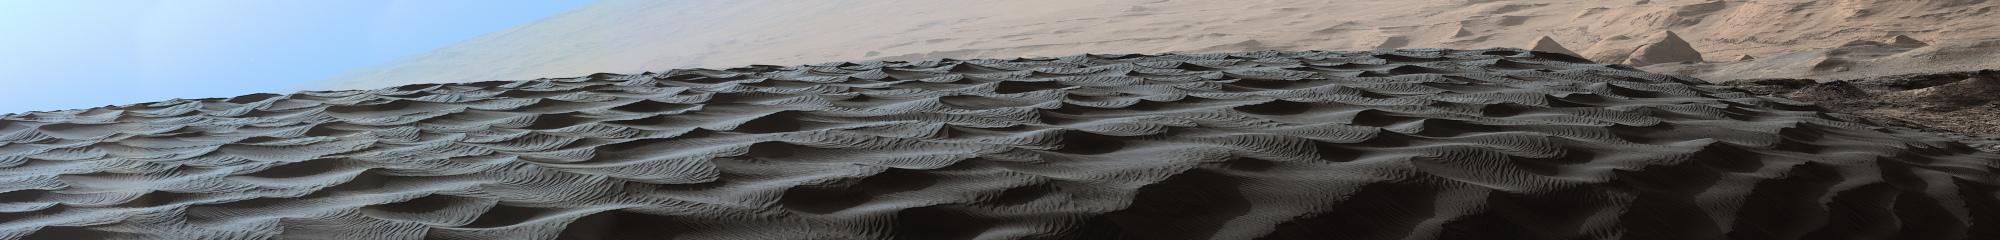 mars-sand-dunes-PIA20755.thumb.jpg.25dfdd1e70e02d41ea76200a49f519b3.jpg